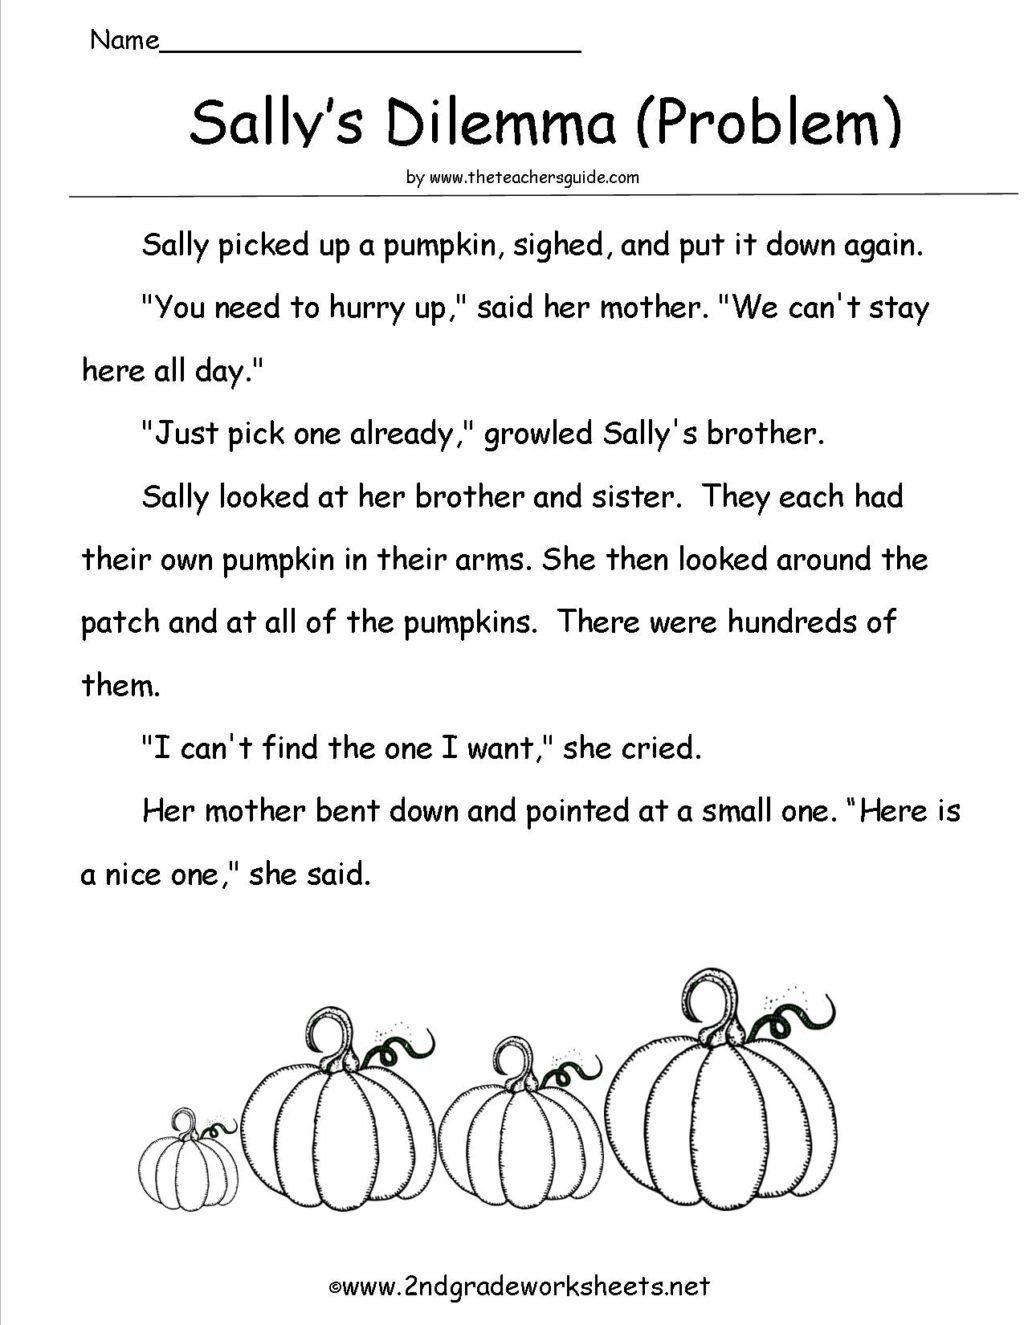 Halloween Reading Comprehension Worksheets Pdf Worksheet Sallysproblem Halloween  Worksheets…   Halloween worksheets [ 1325 x 1024 Pixel ]